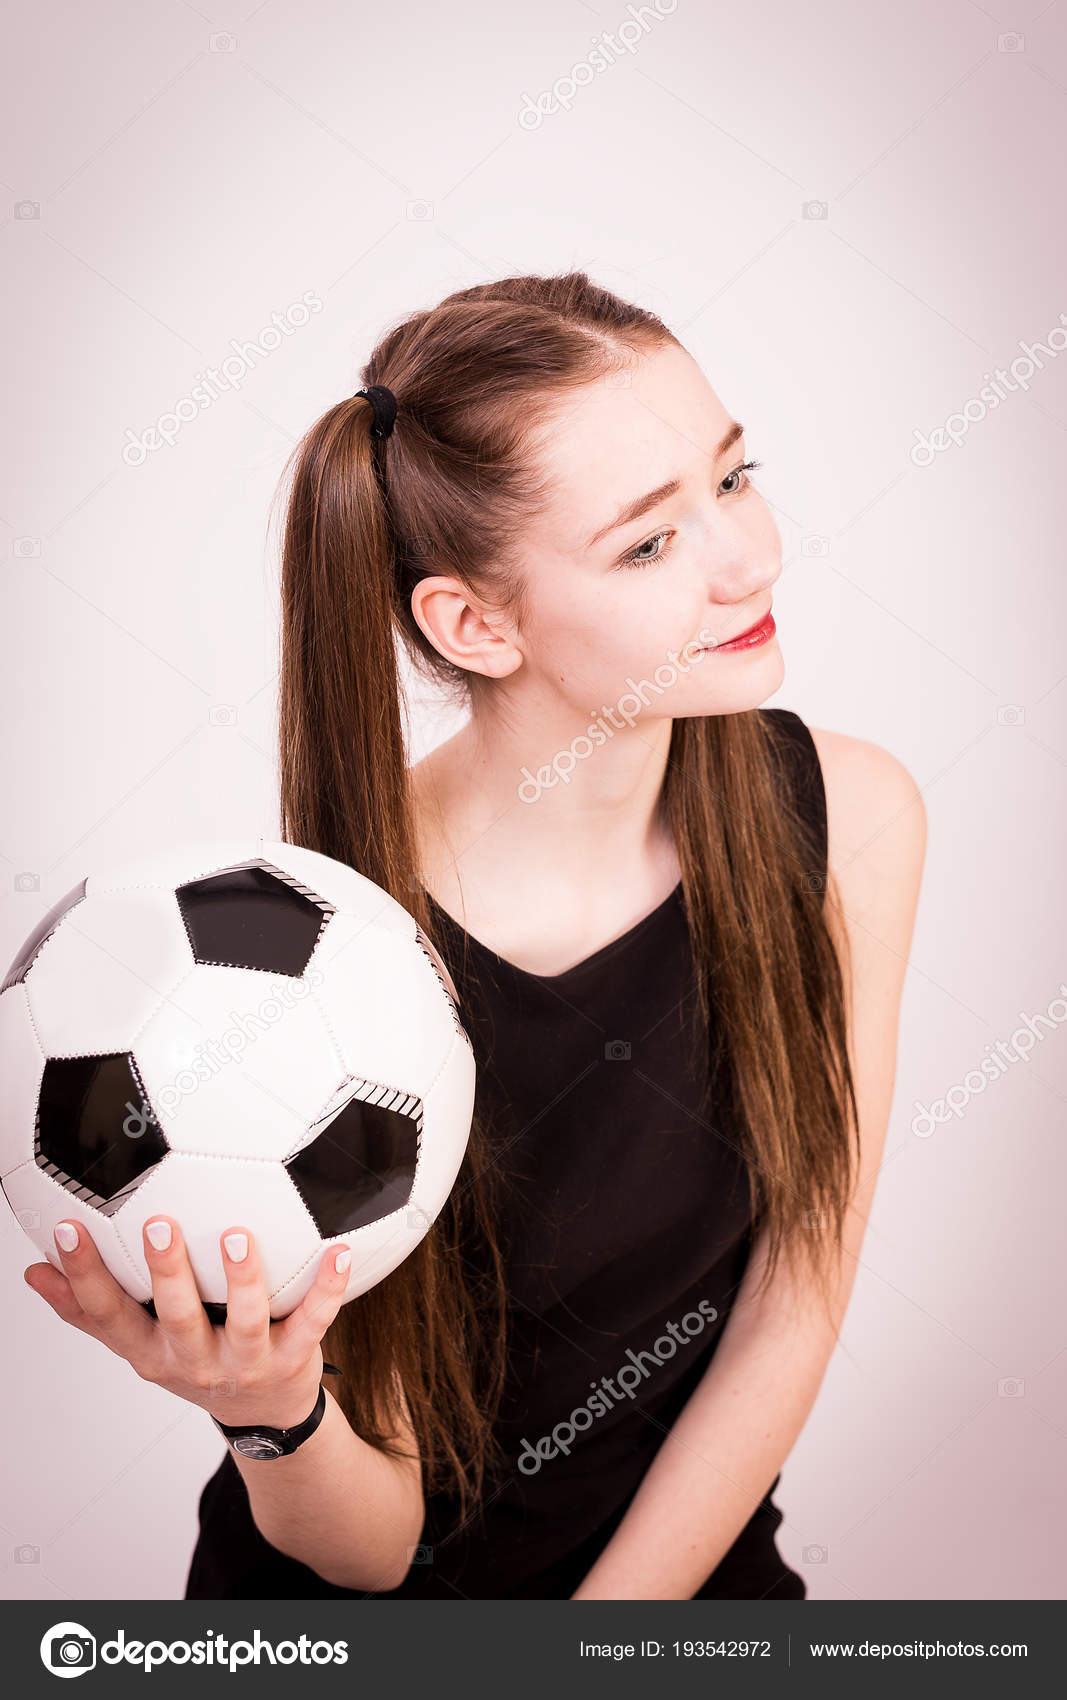 Jeune Fille Robe Mariée Avec Ballon Pour Match Football